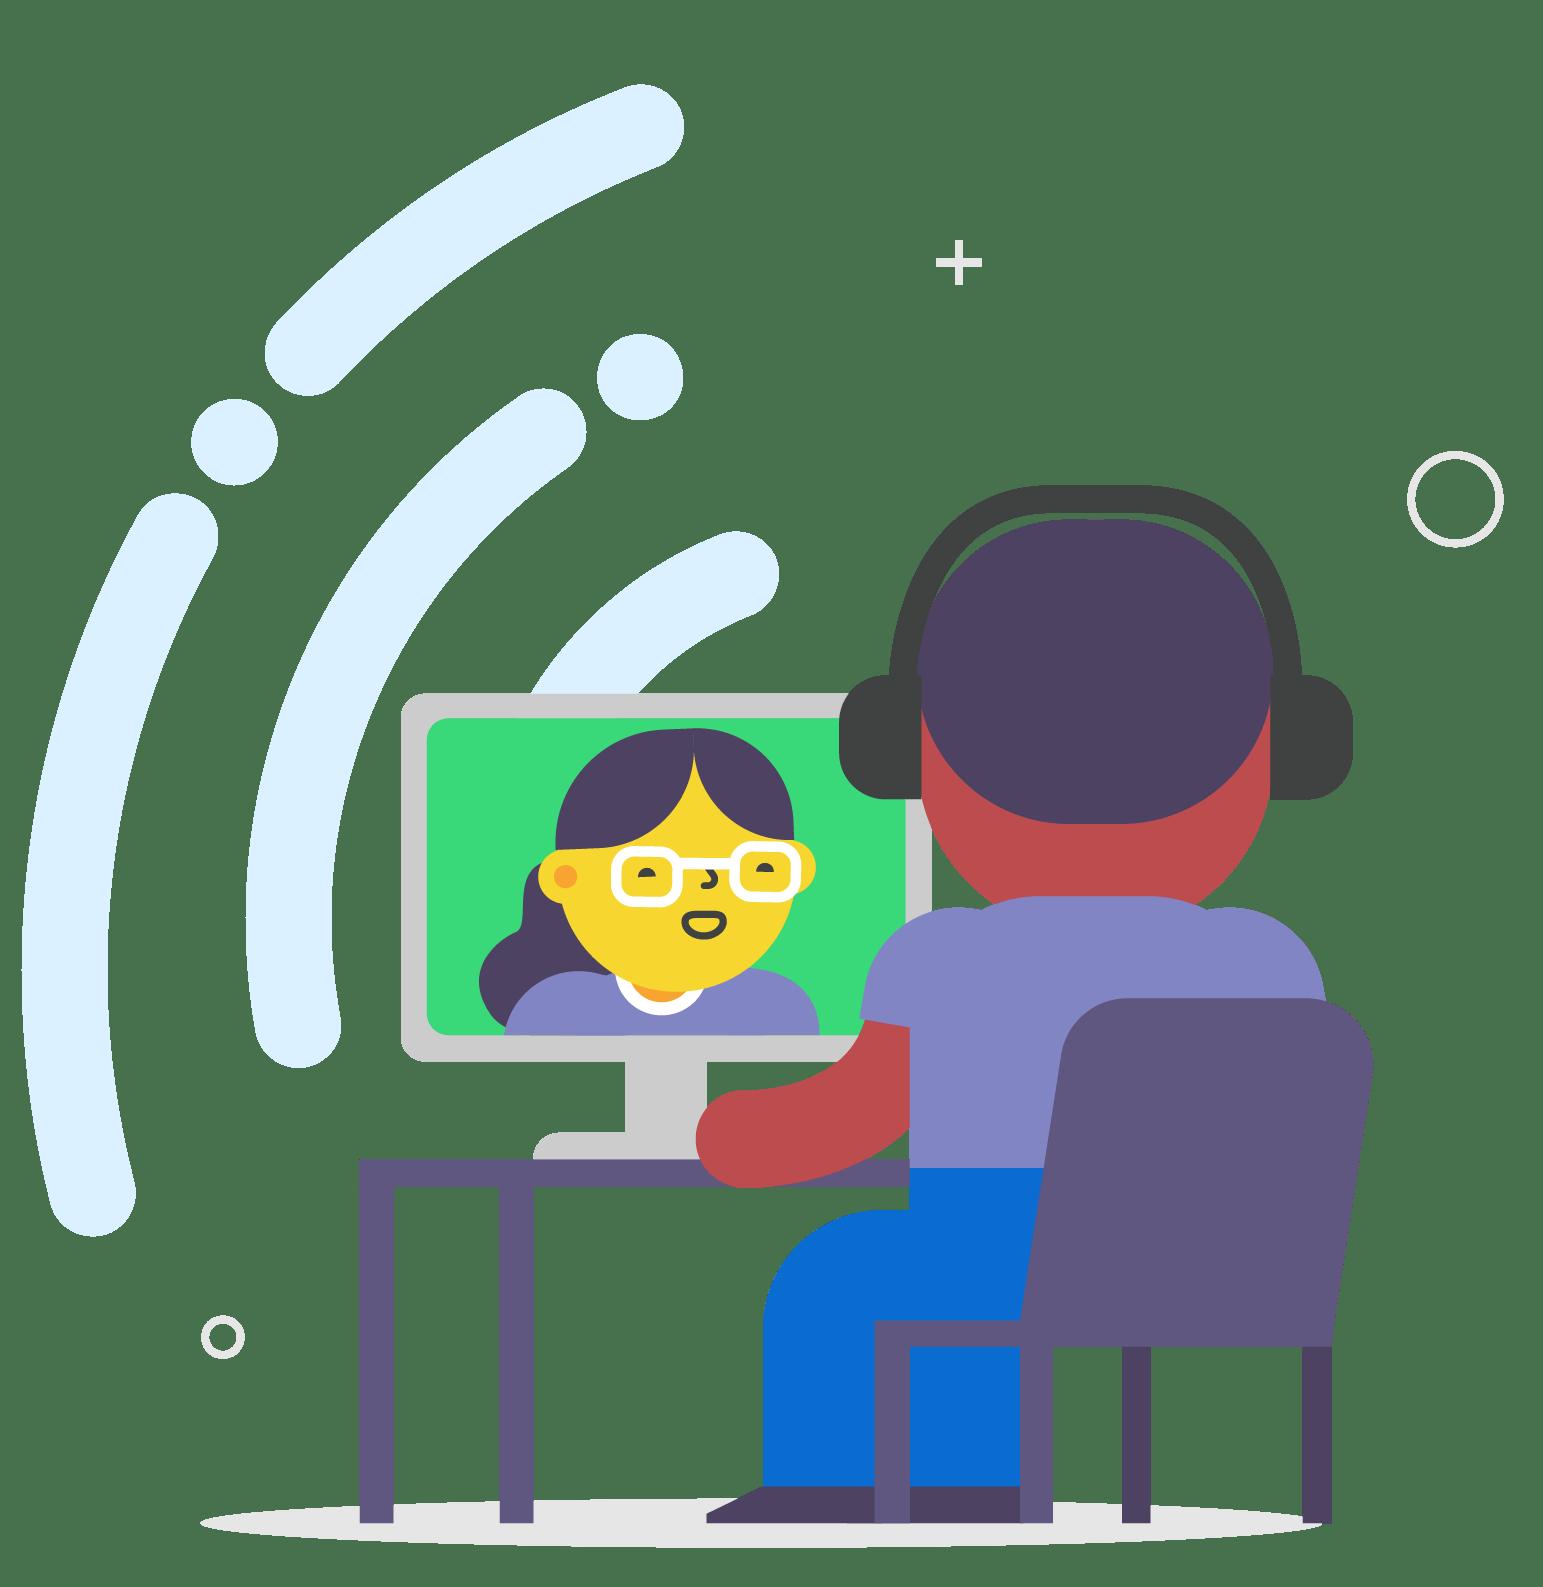 Chanty-team-chat-audio-video-calls